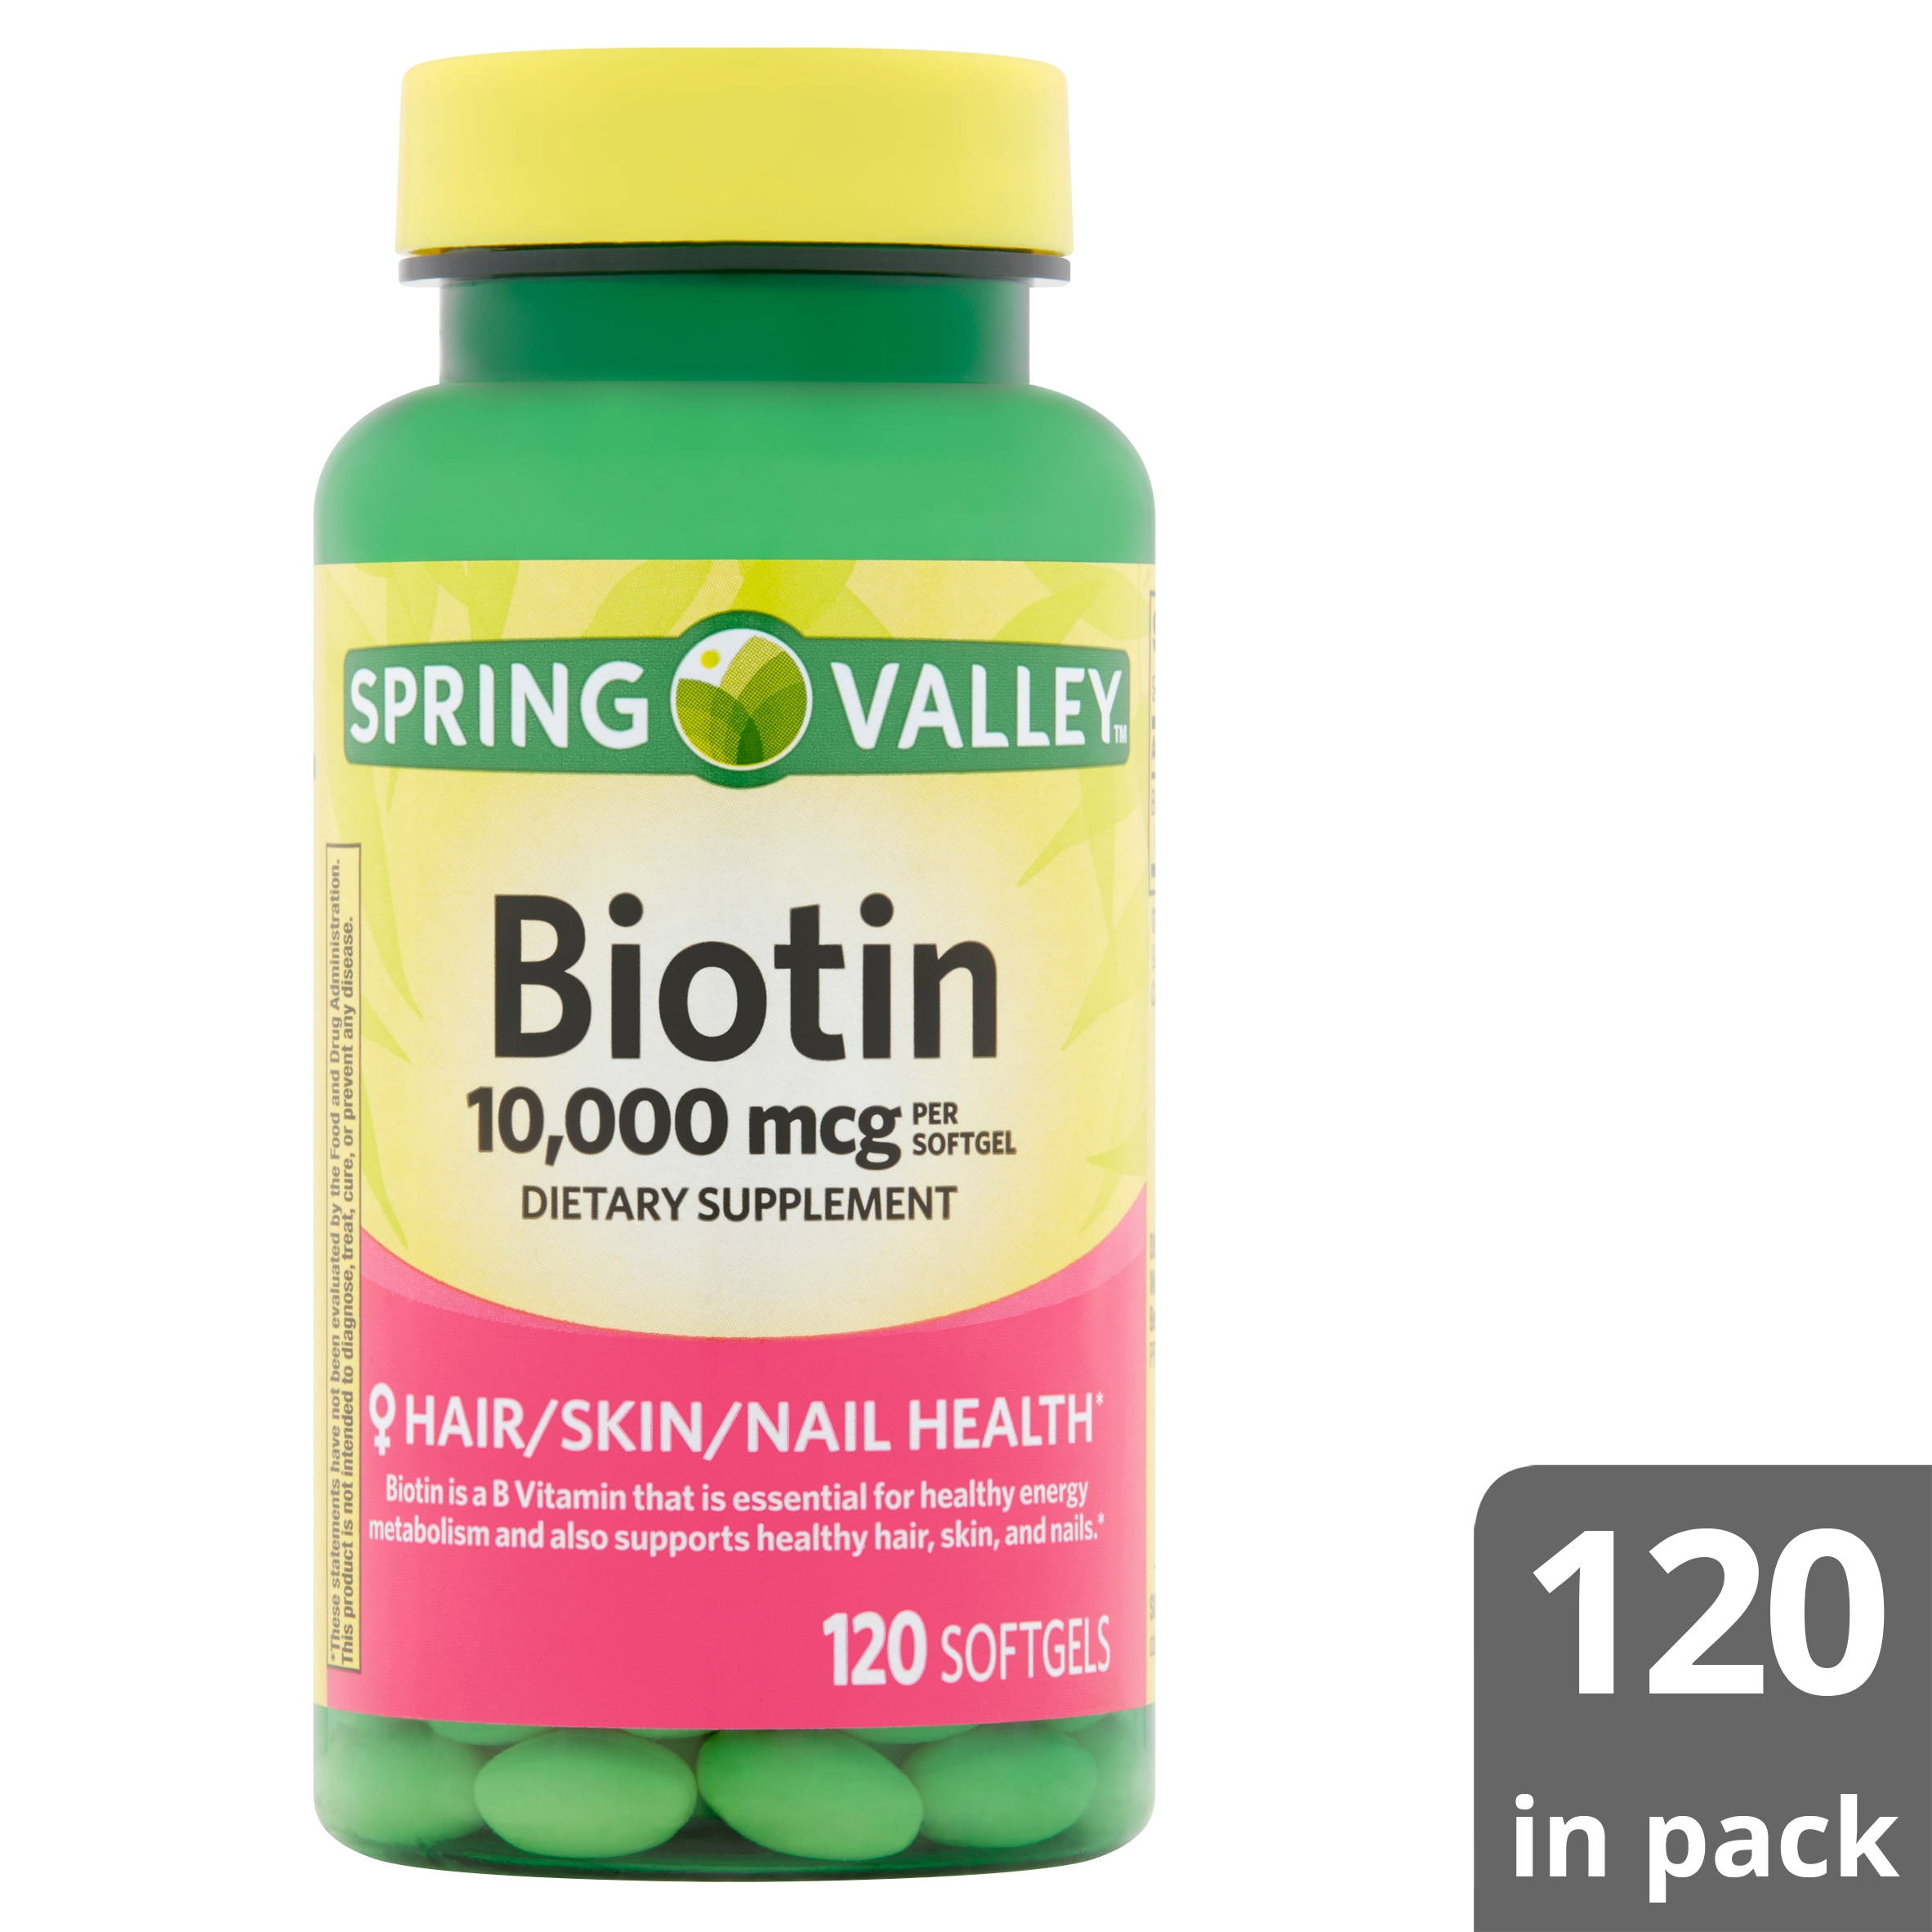 Spring Valley Biotin Softgels 648fa69153d0